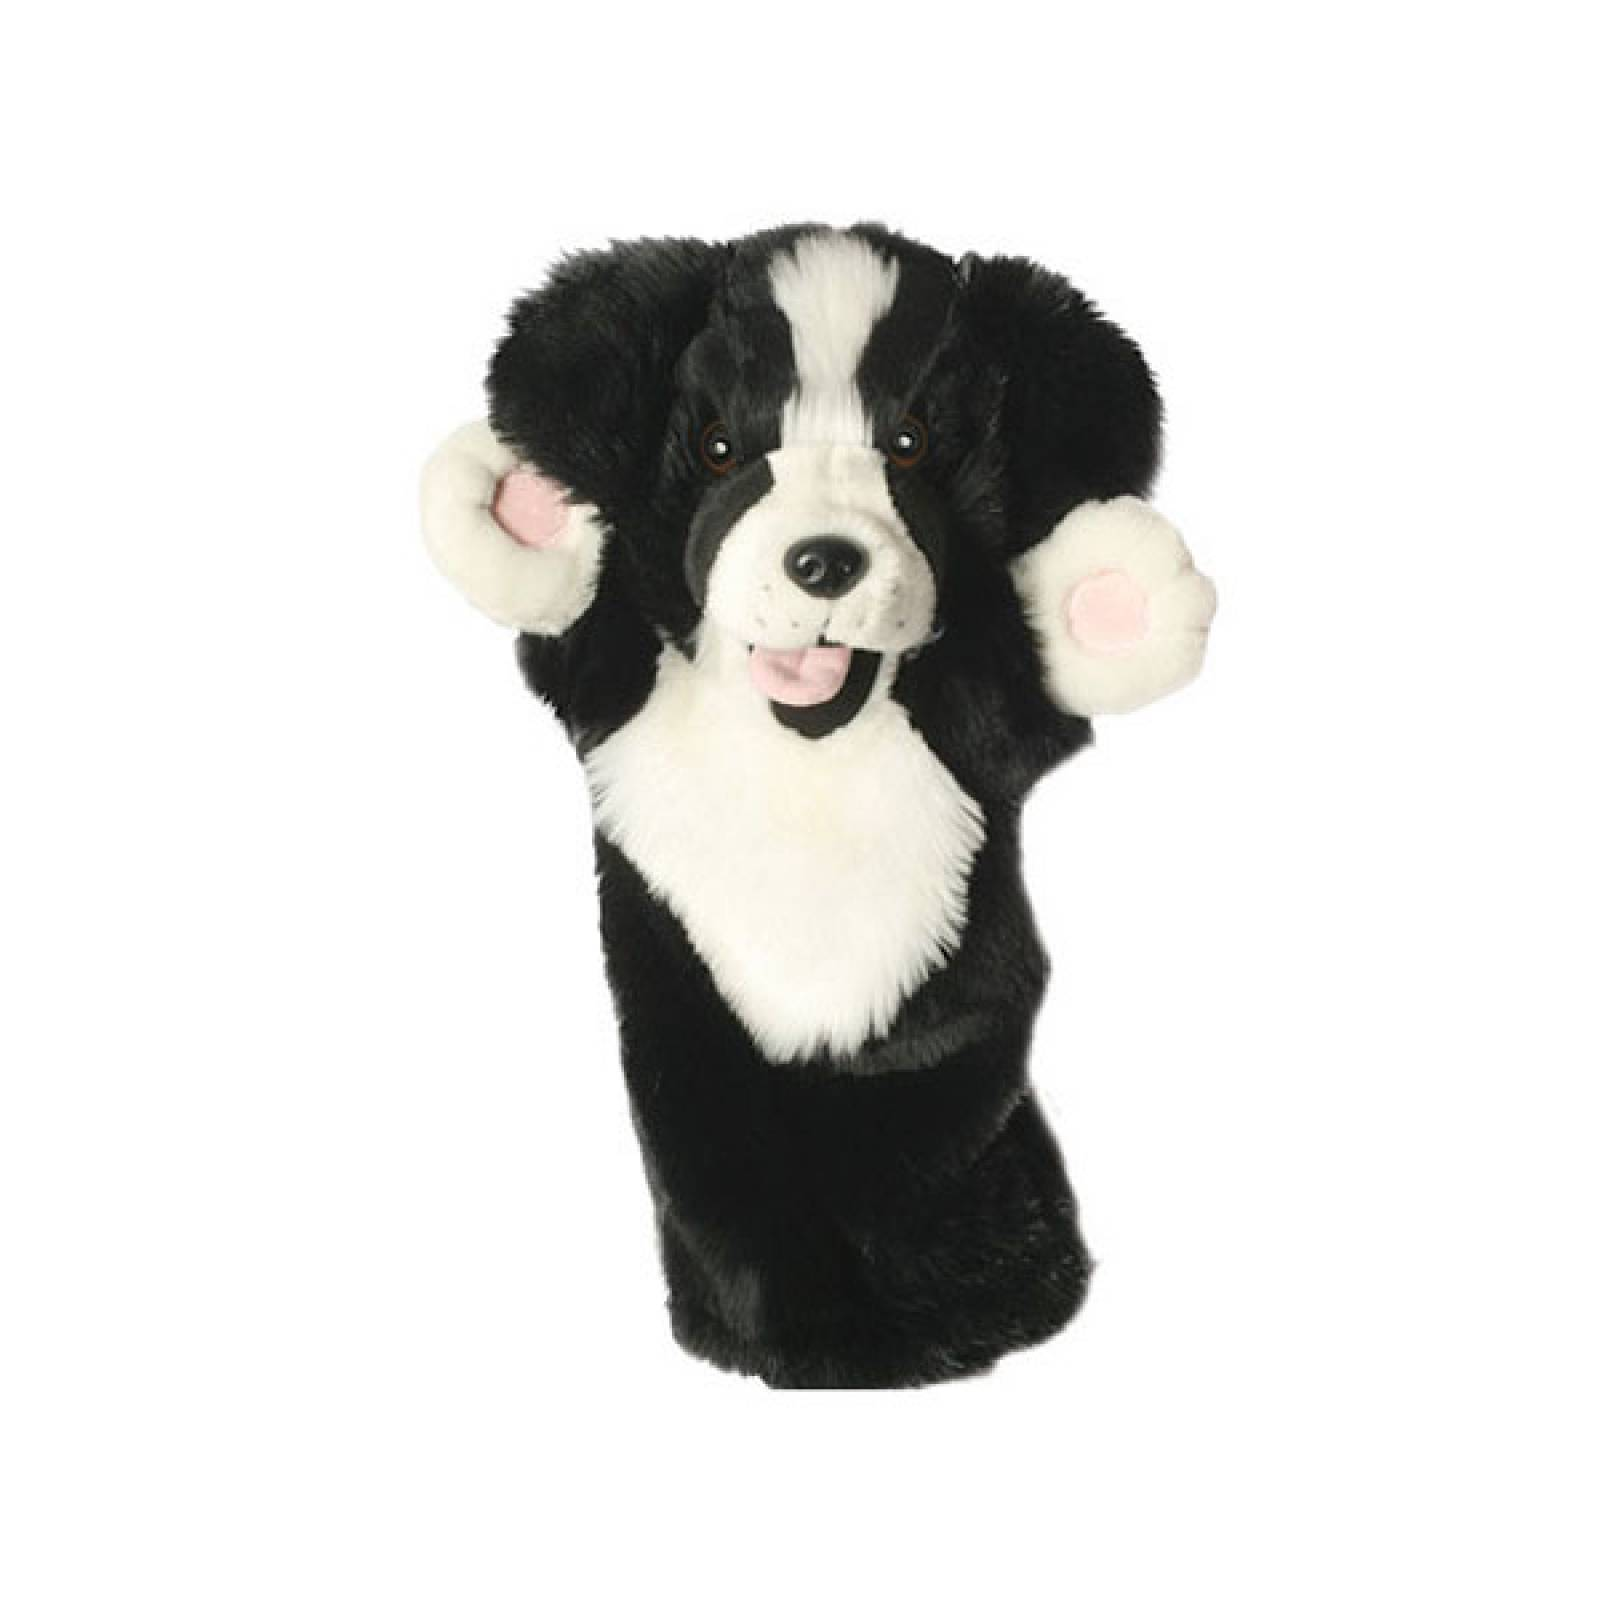 BORDER COLLIE DOG Long Sleeved Glove Puppet